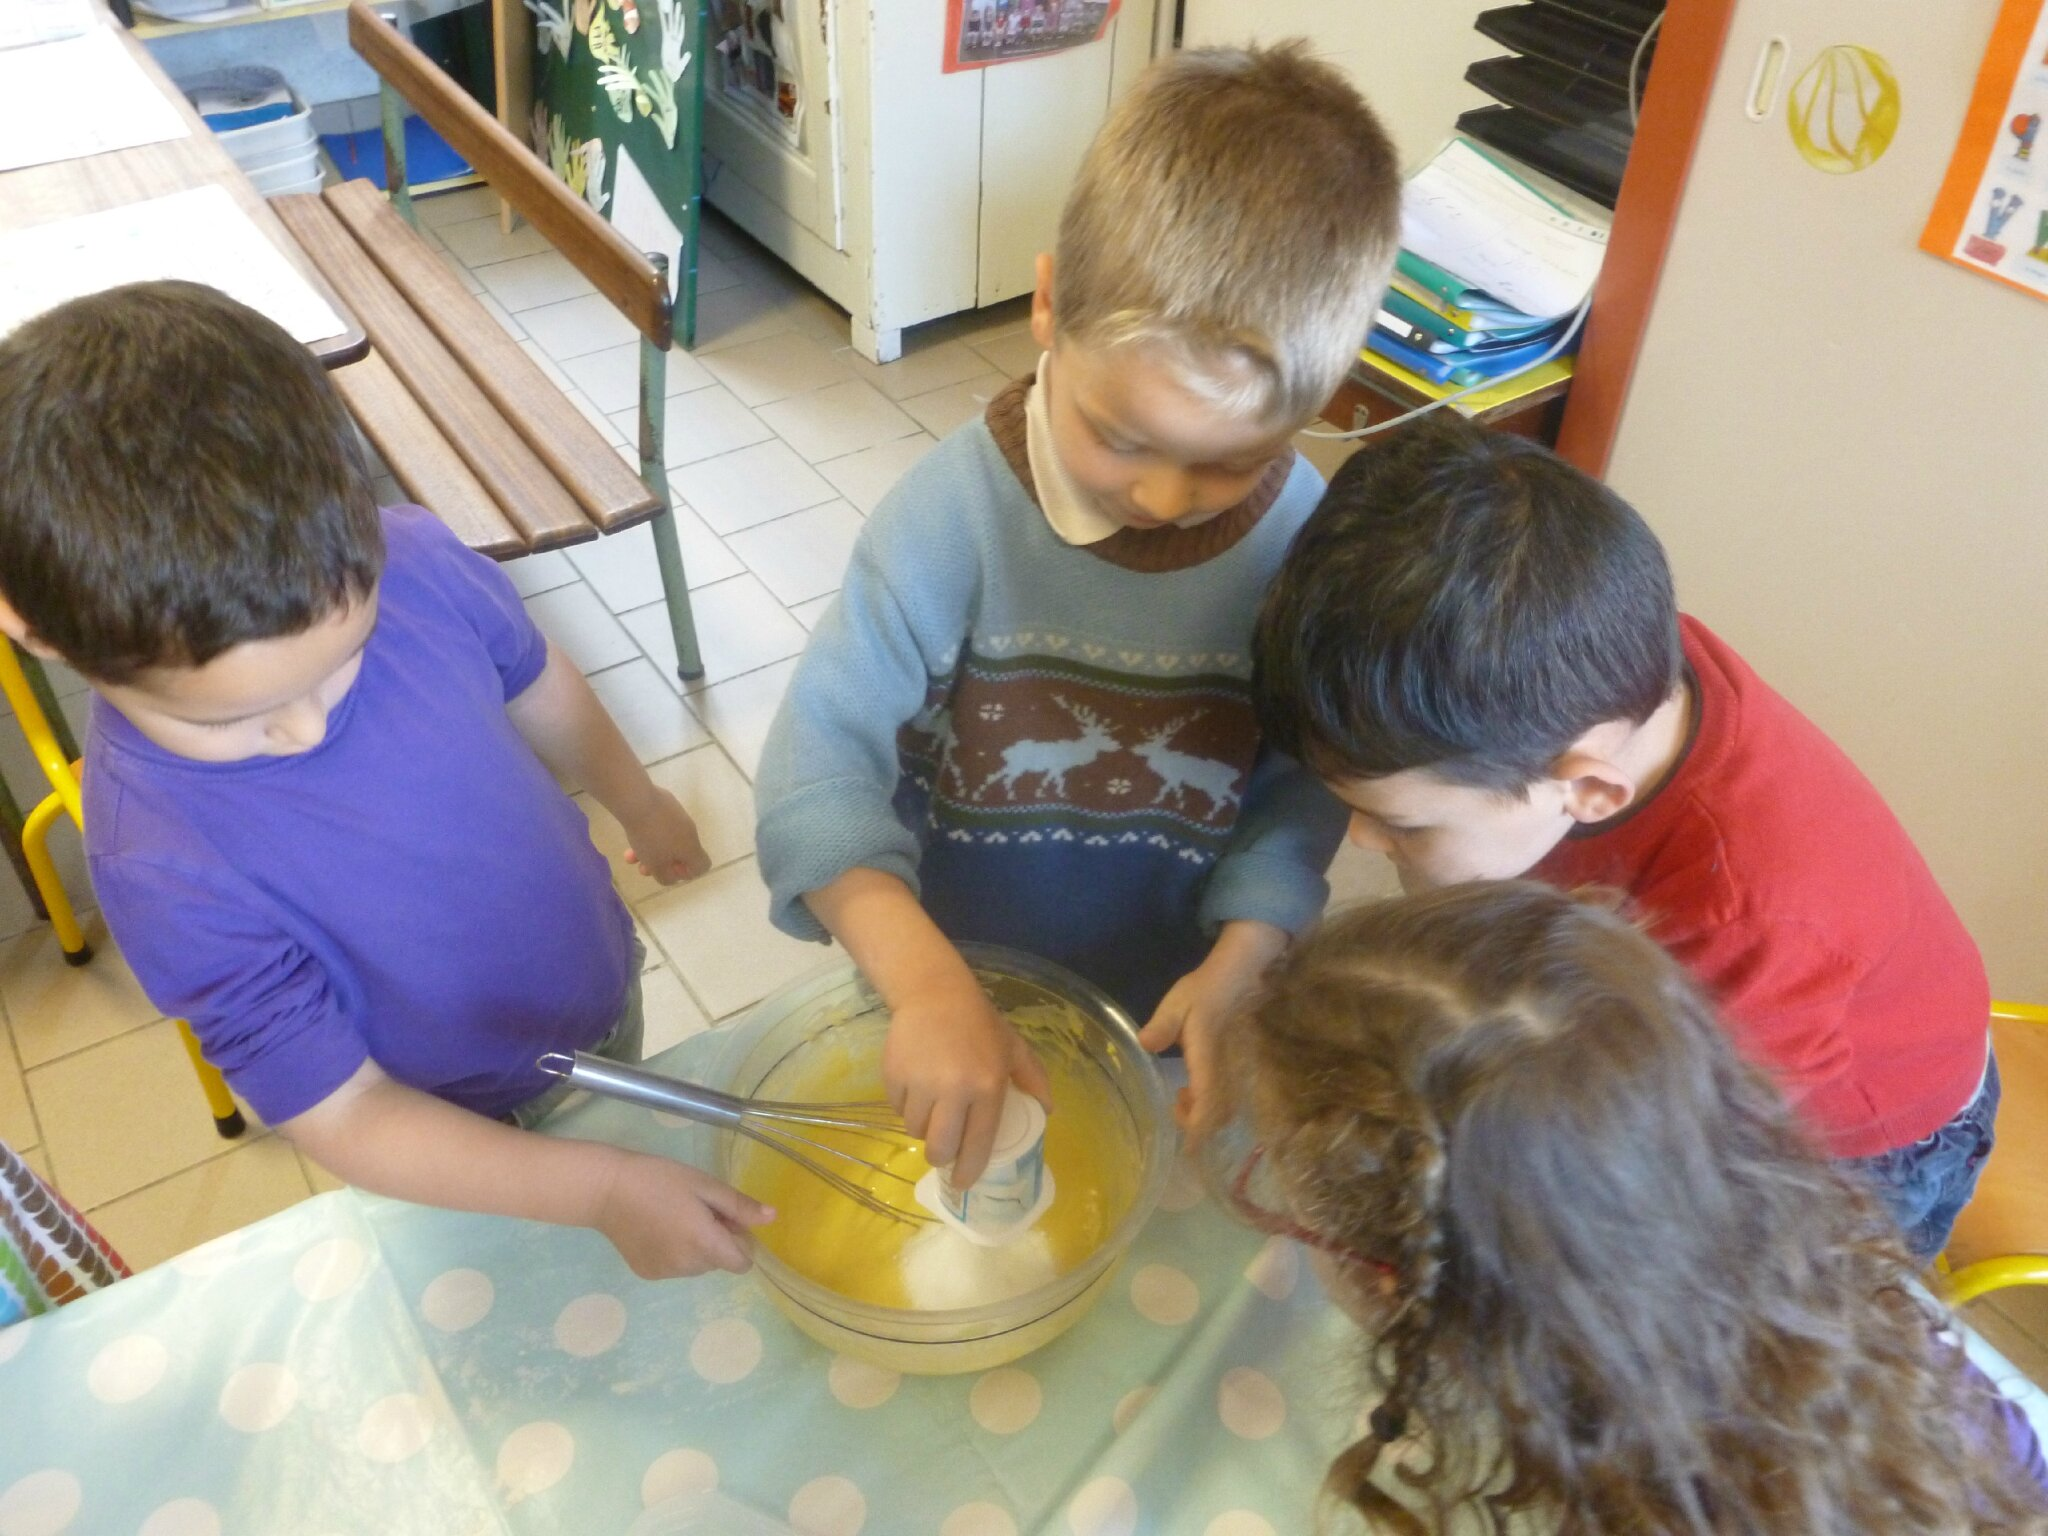 Atelier cuisine avril et anniversaires en maternelle - Atelier cuisine maternelle ...